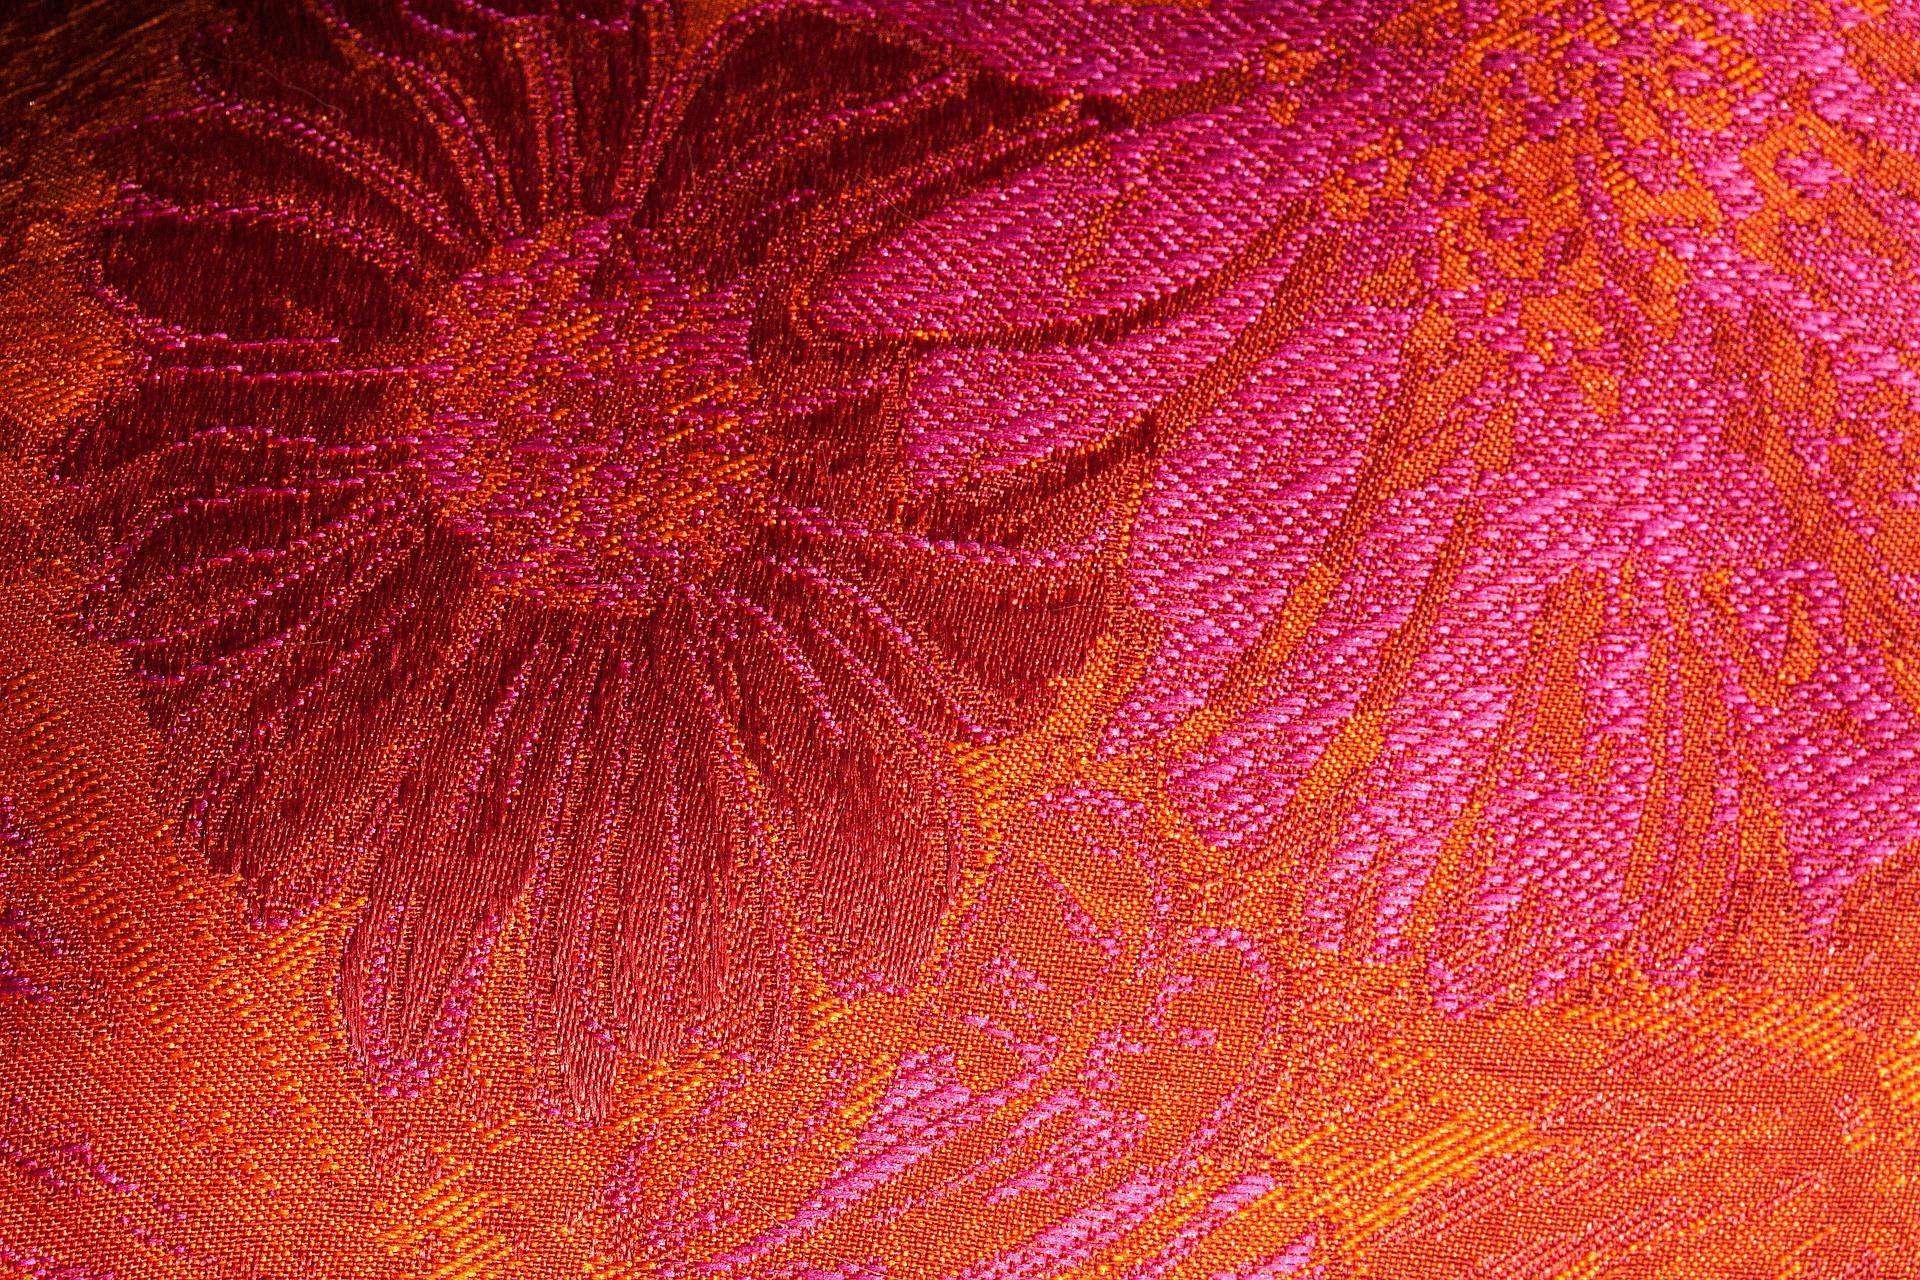 Fabric Art, Art, Cloth, Design, Fabric, HQ Photo